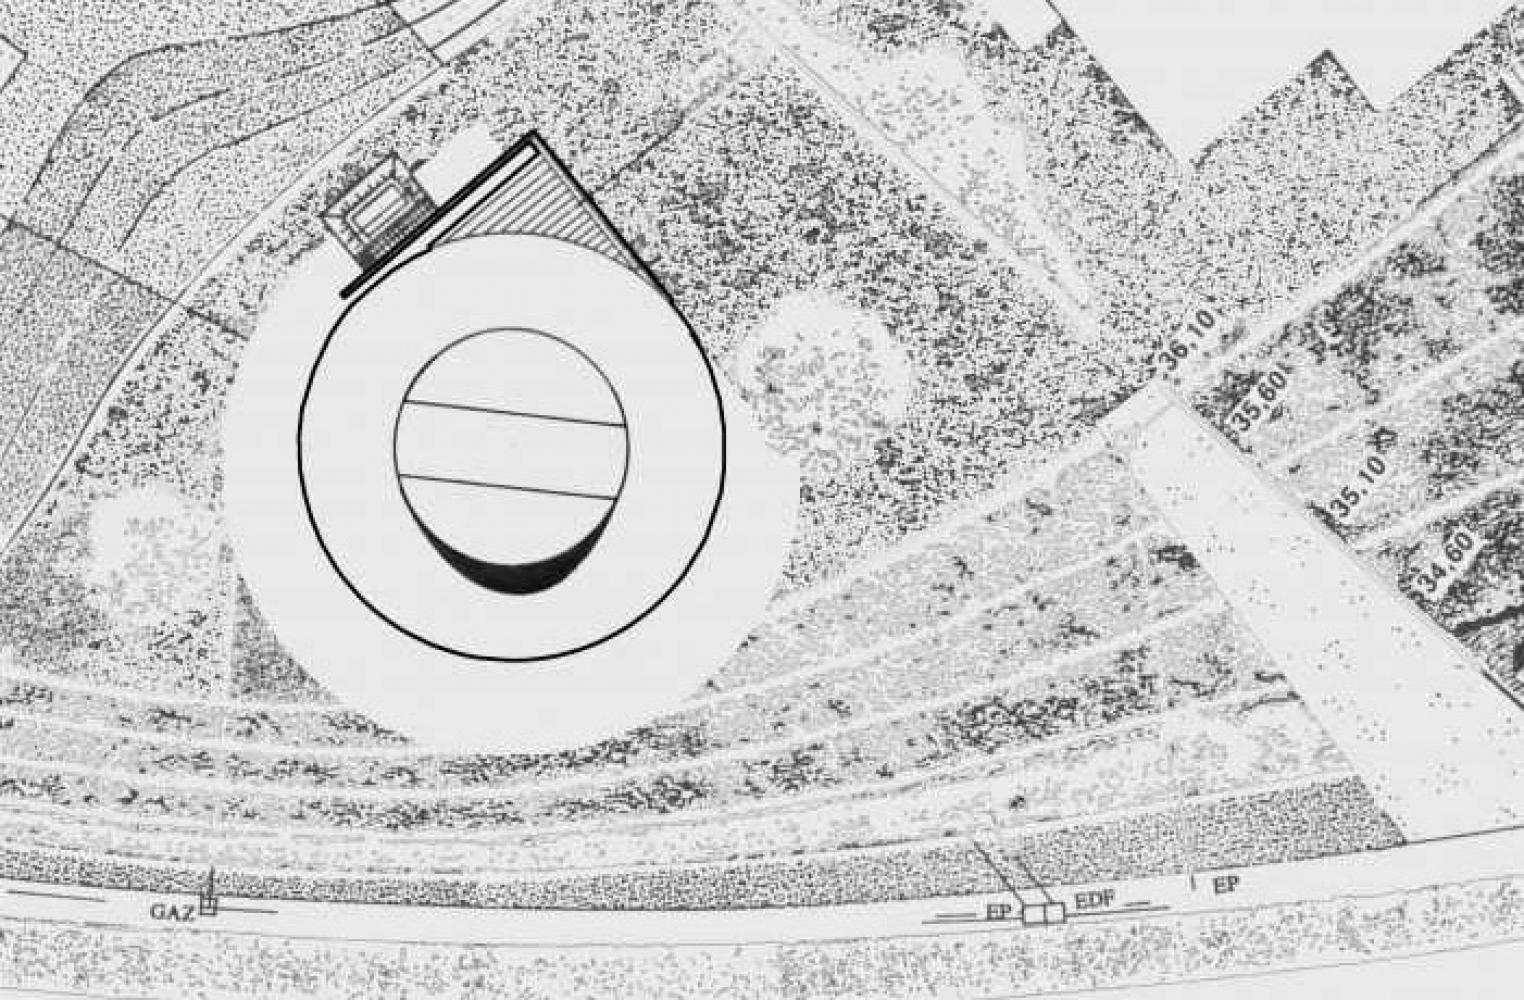 10-21-avoine-img-002 Pascale SEURIN Architecte - Pascale SEURIN Architecte